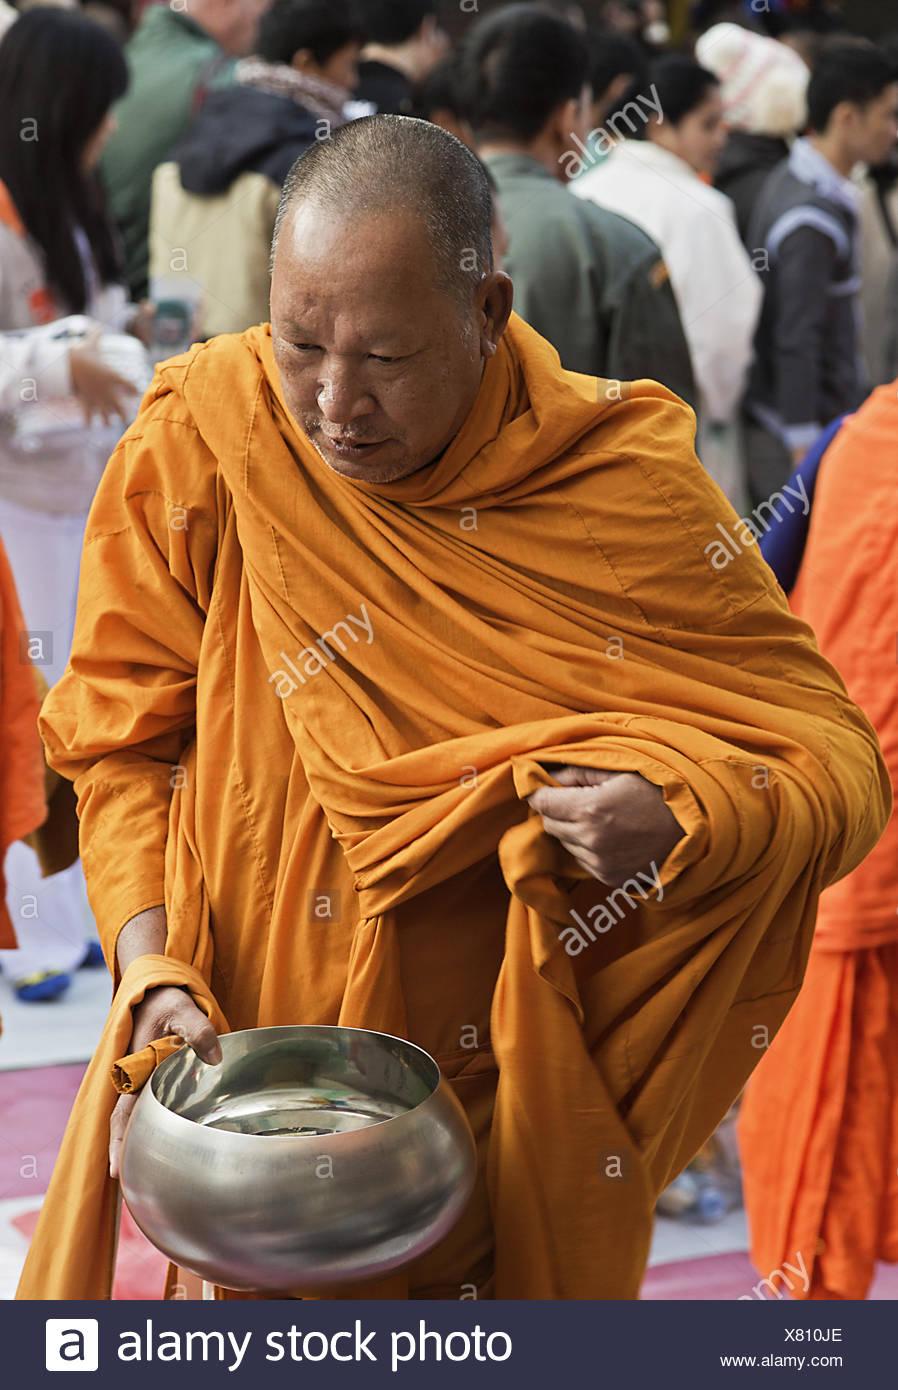 Monk - Stock Image